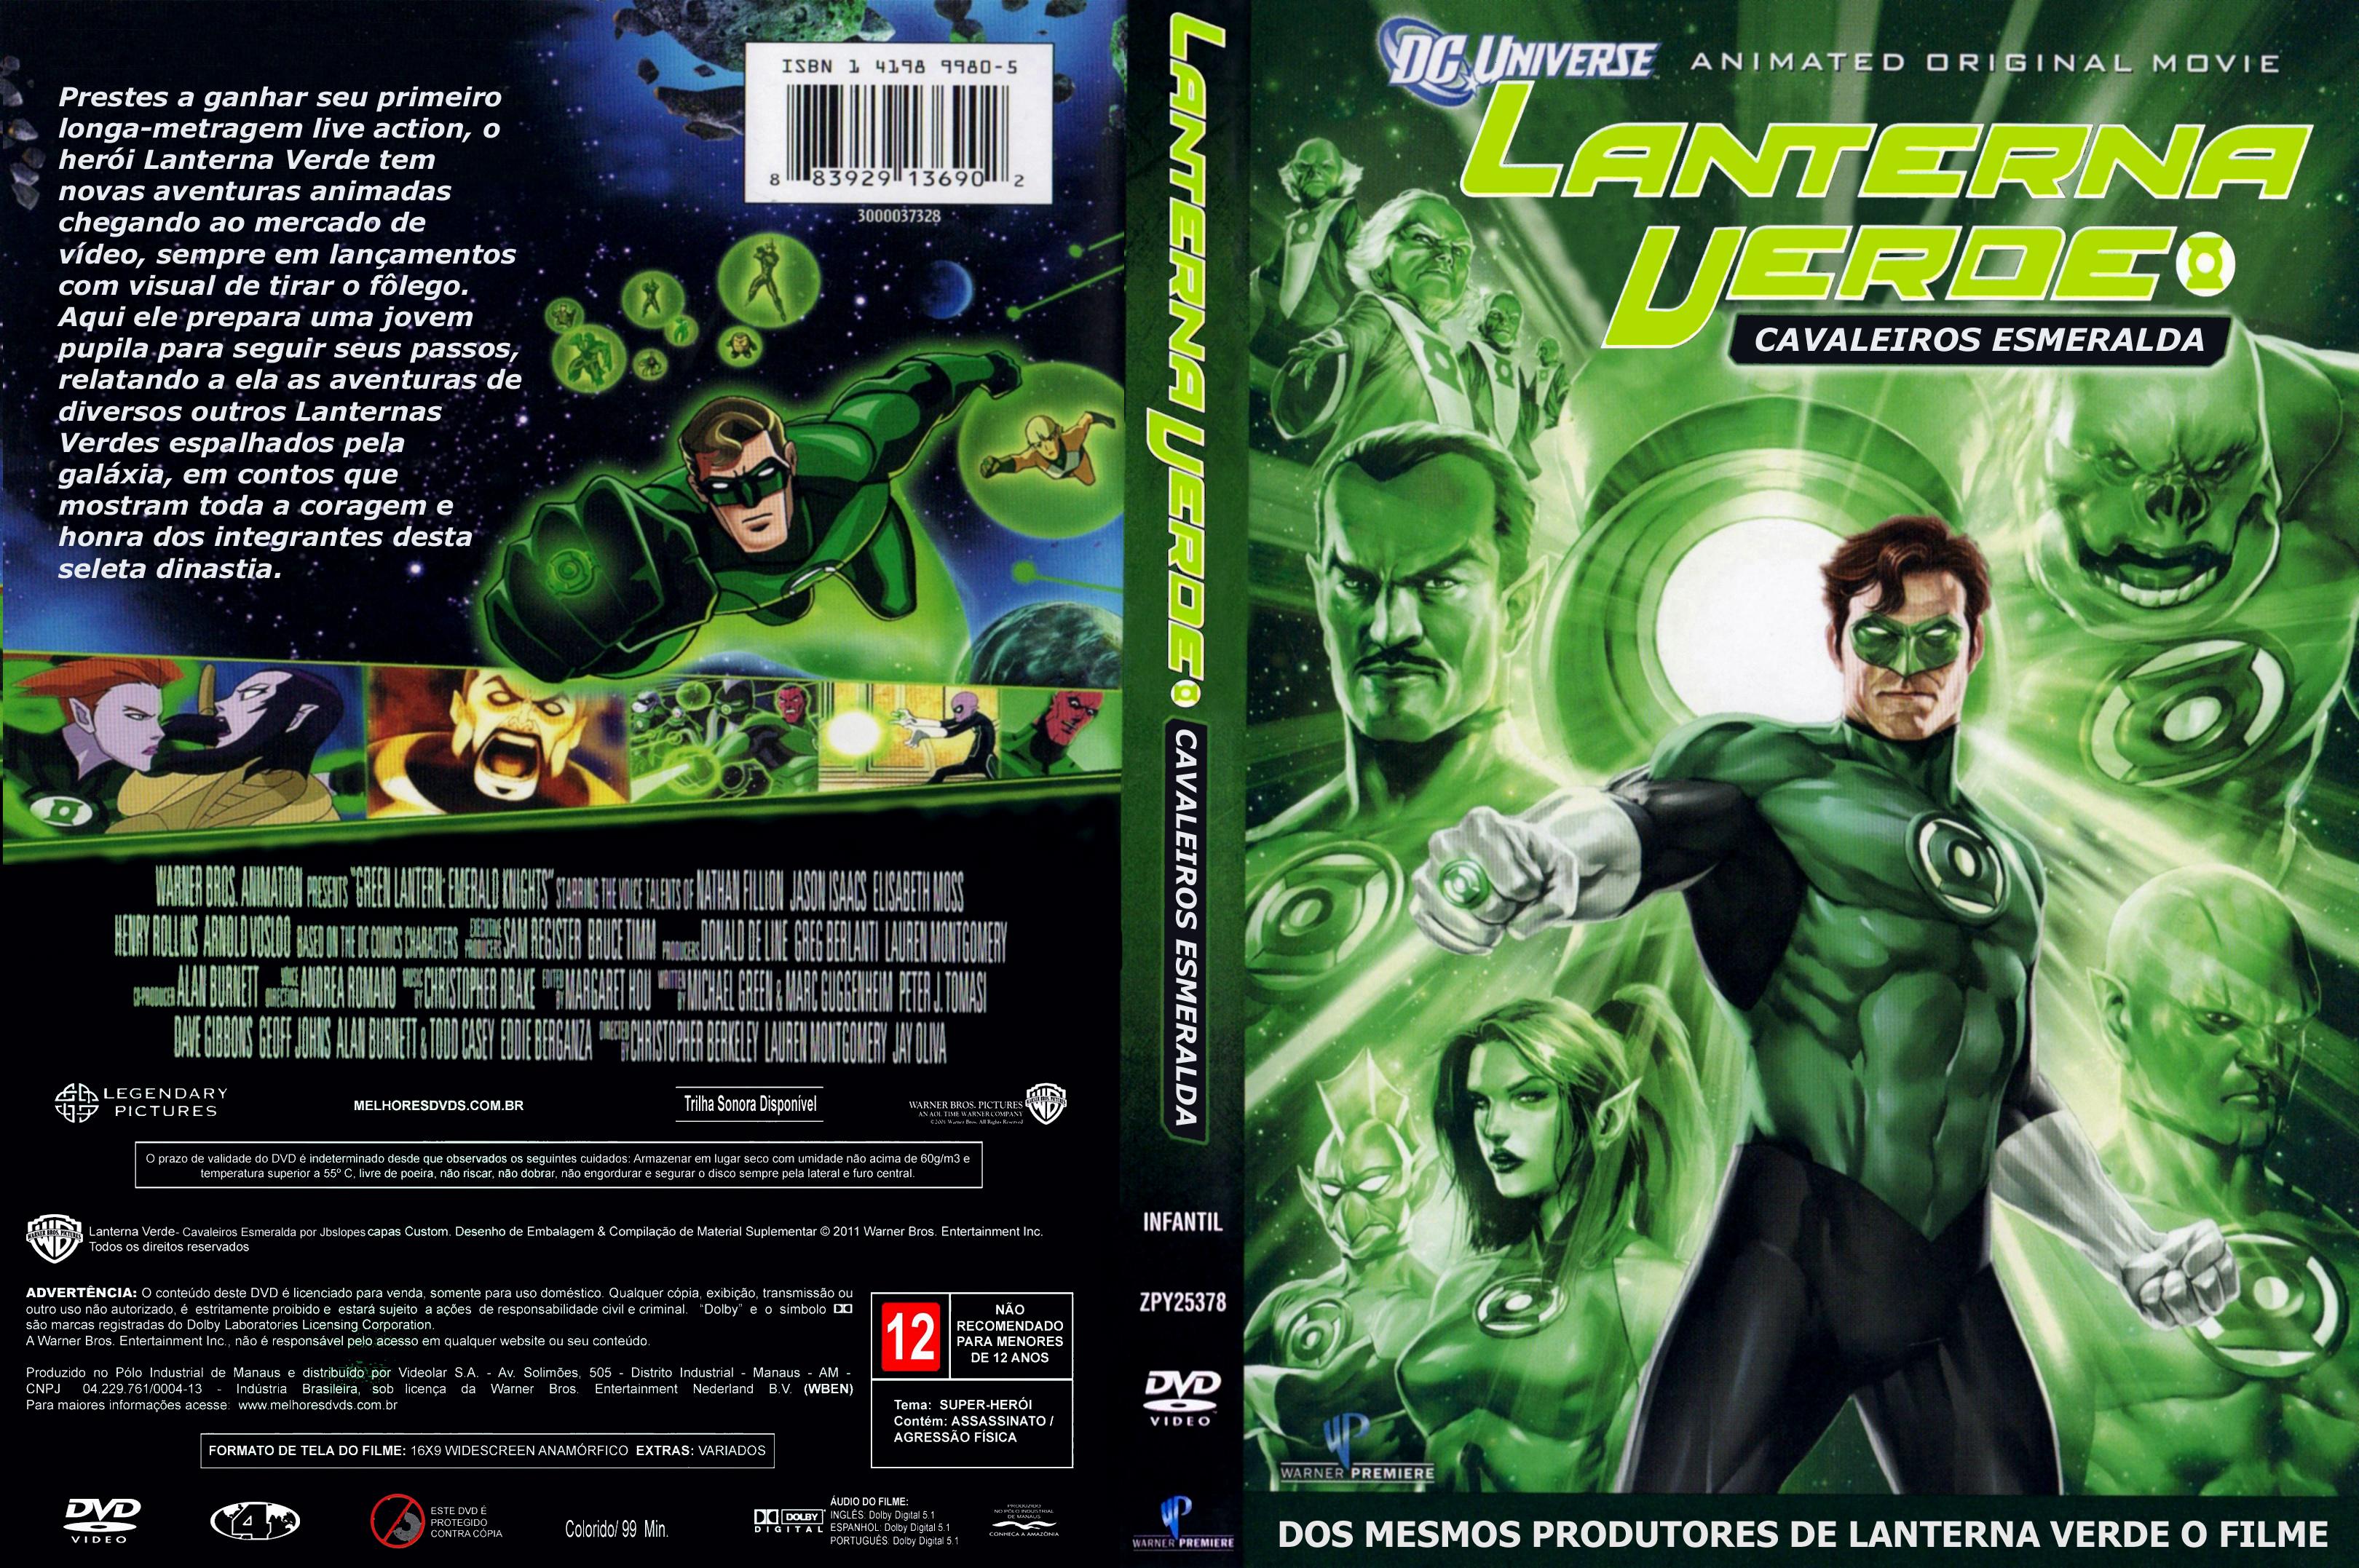 lanterna verde  cavaleiros esmeralda  2011  bluray 1080p dual  u00c1udio - animes -